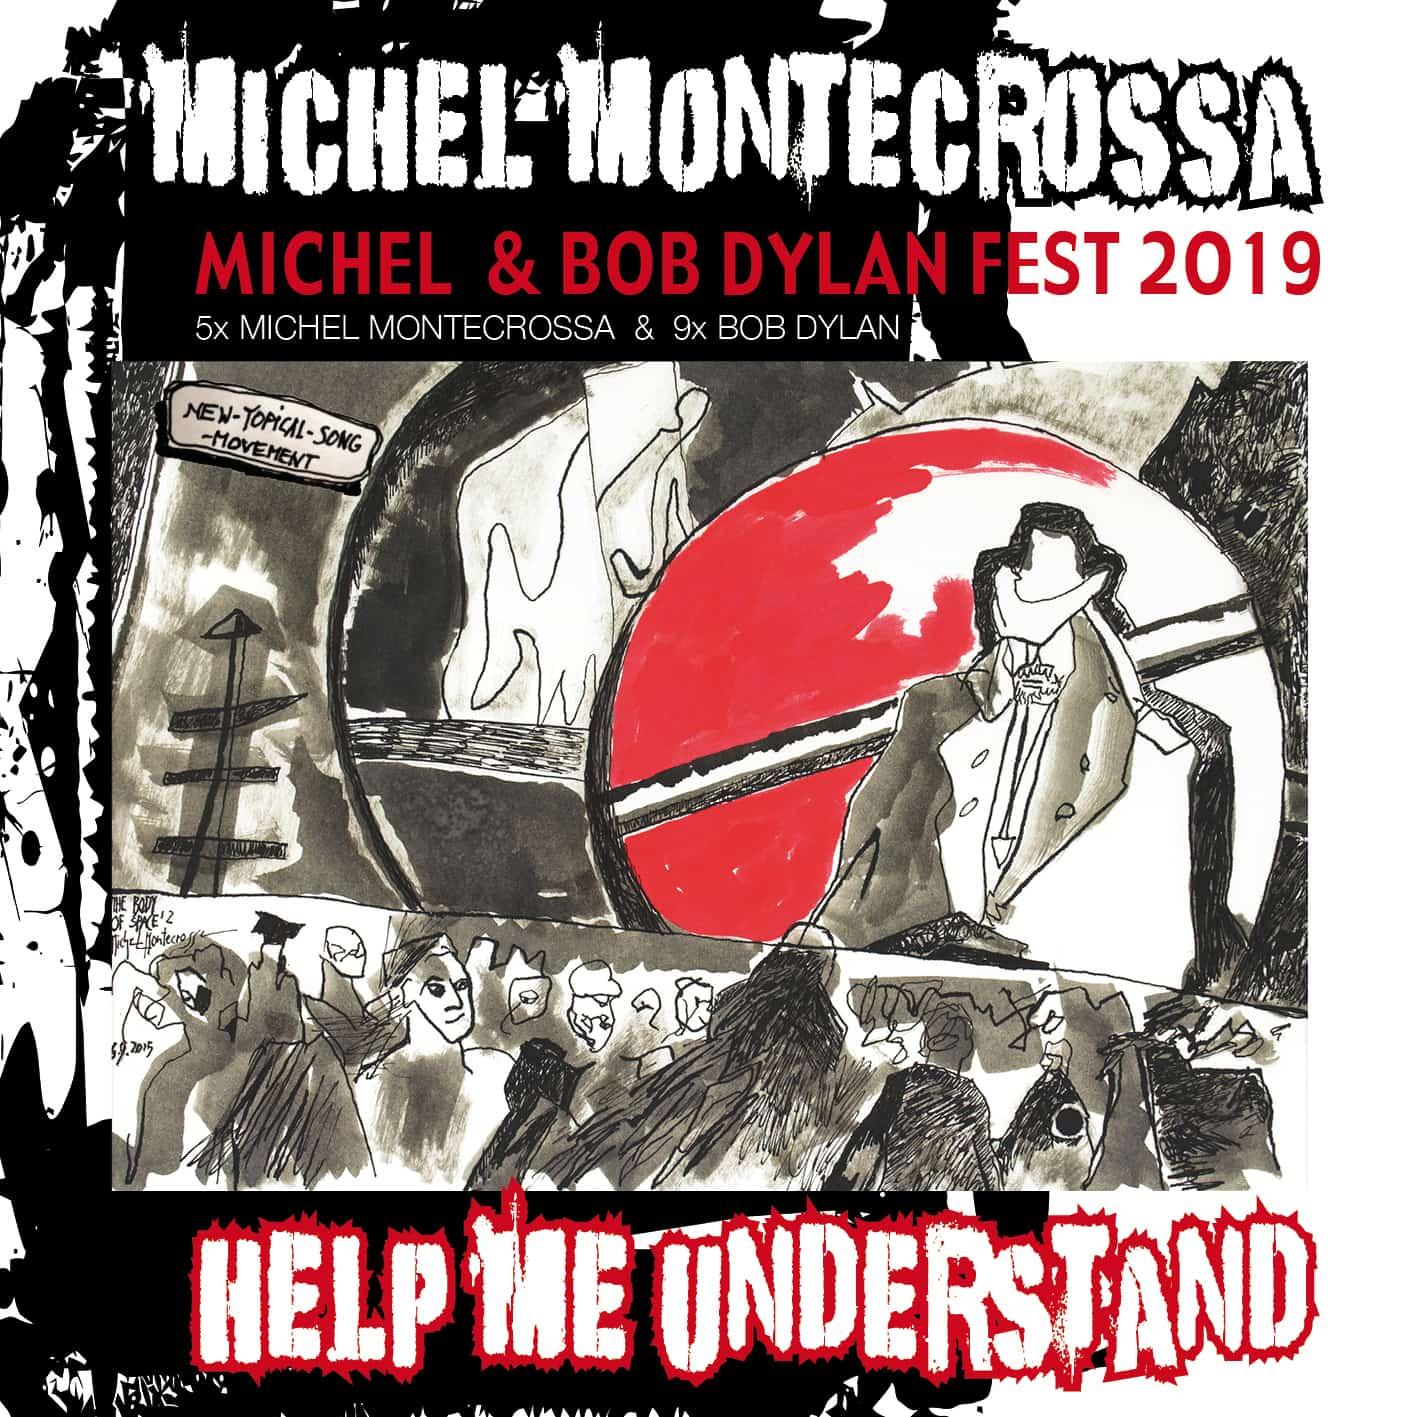 Help Me Understand - Michel Montecrossa's Michel & Bob Dylan Fest 2019